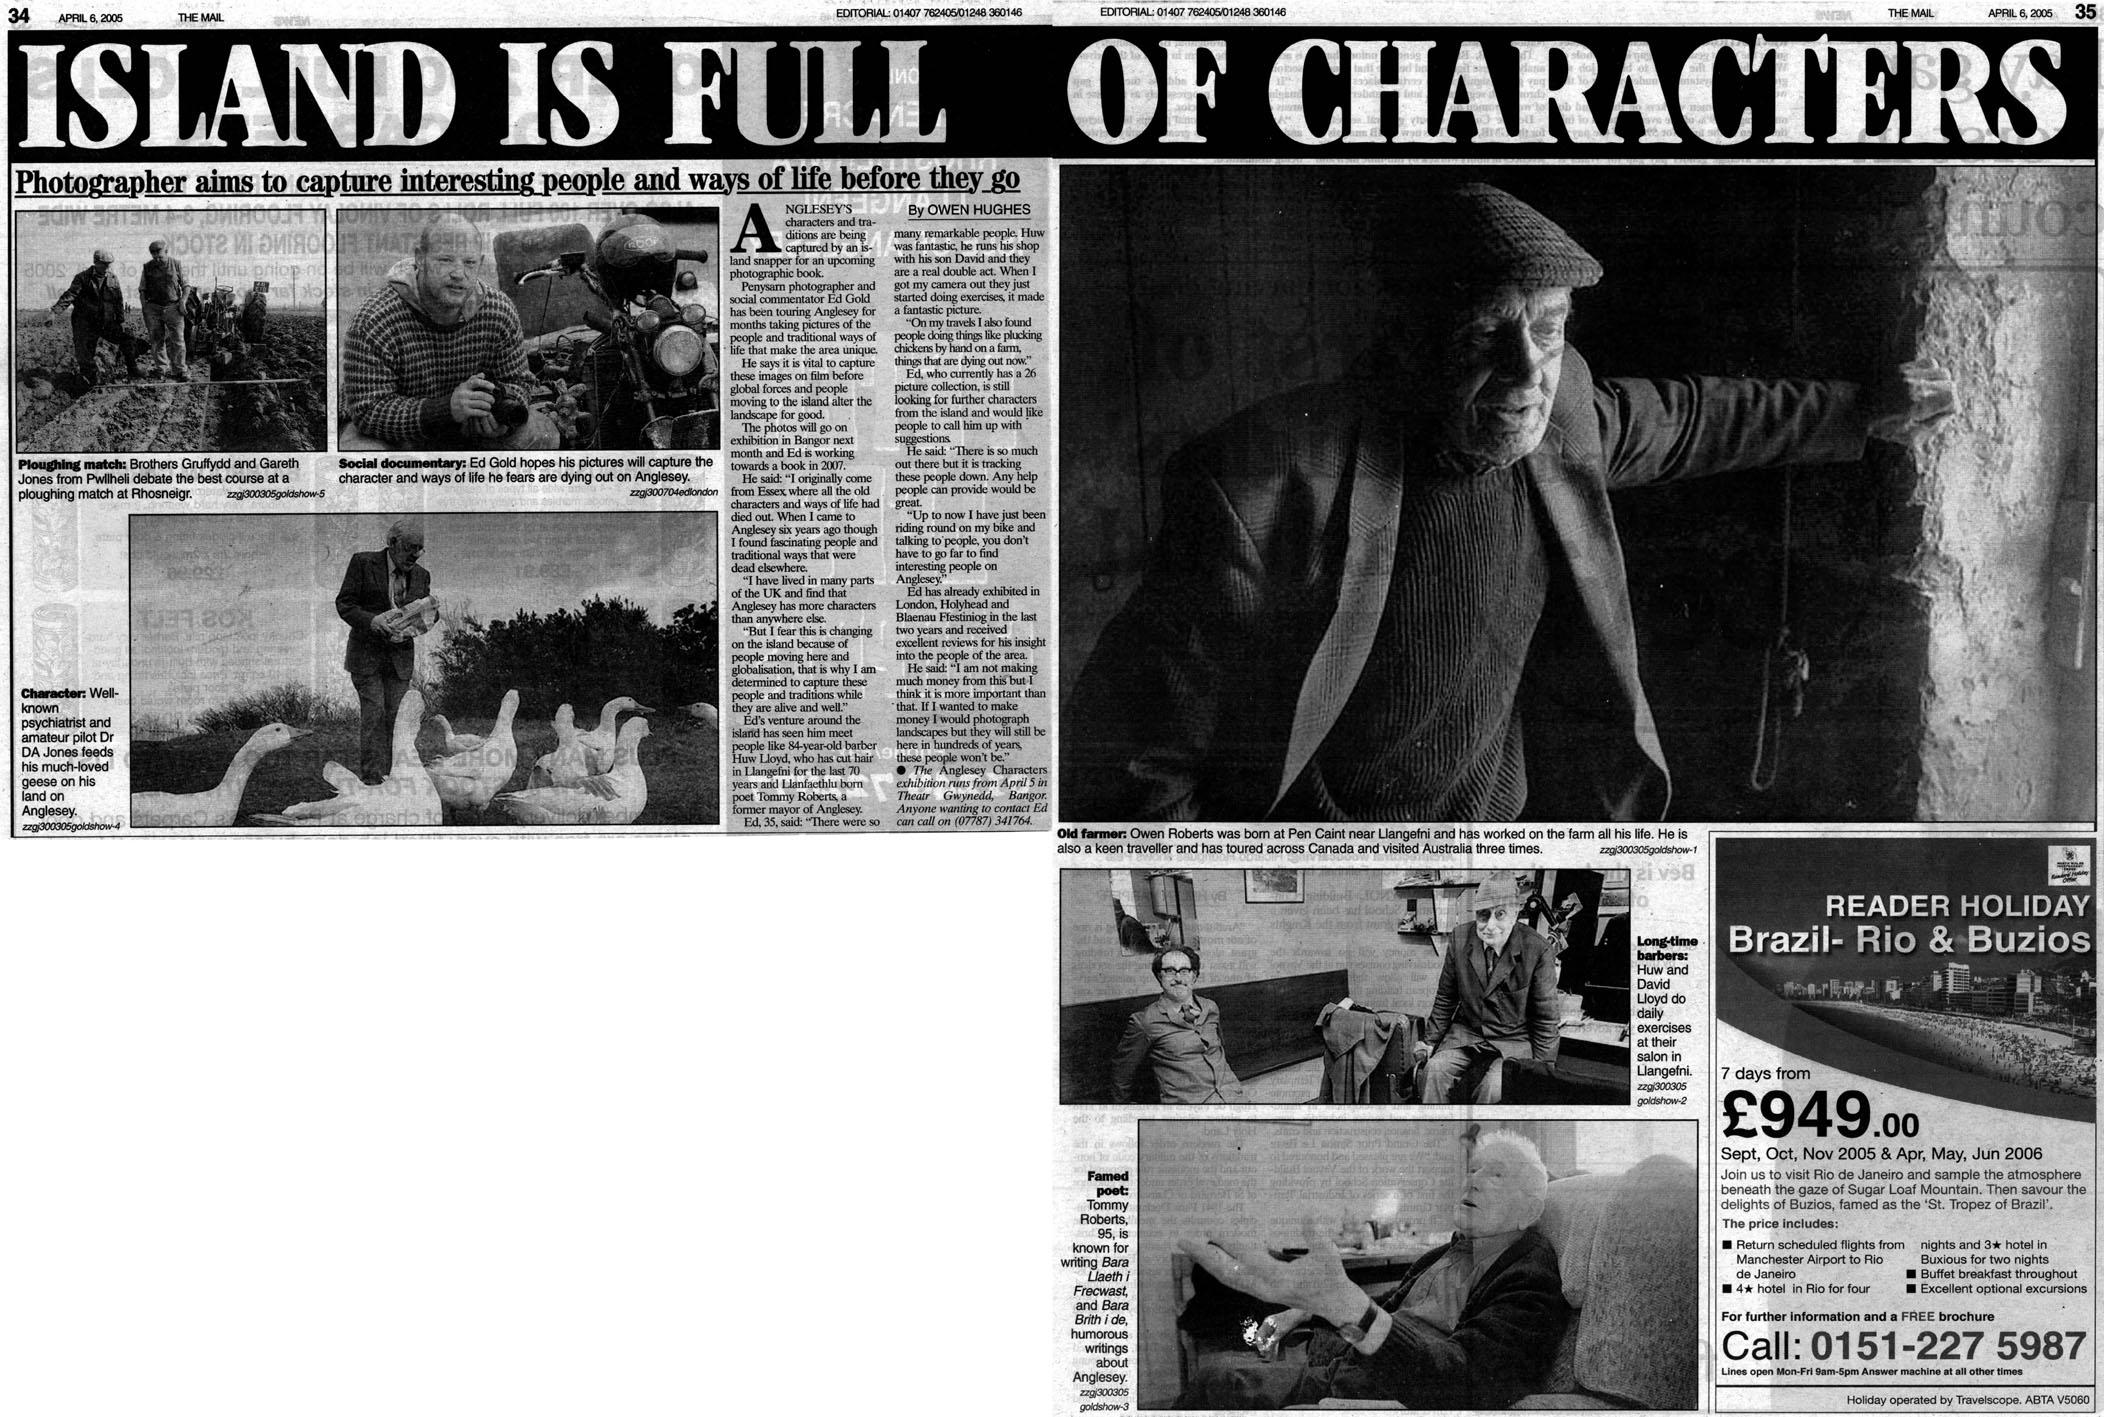 06 April 2005